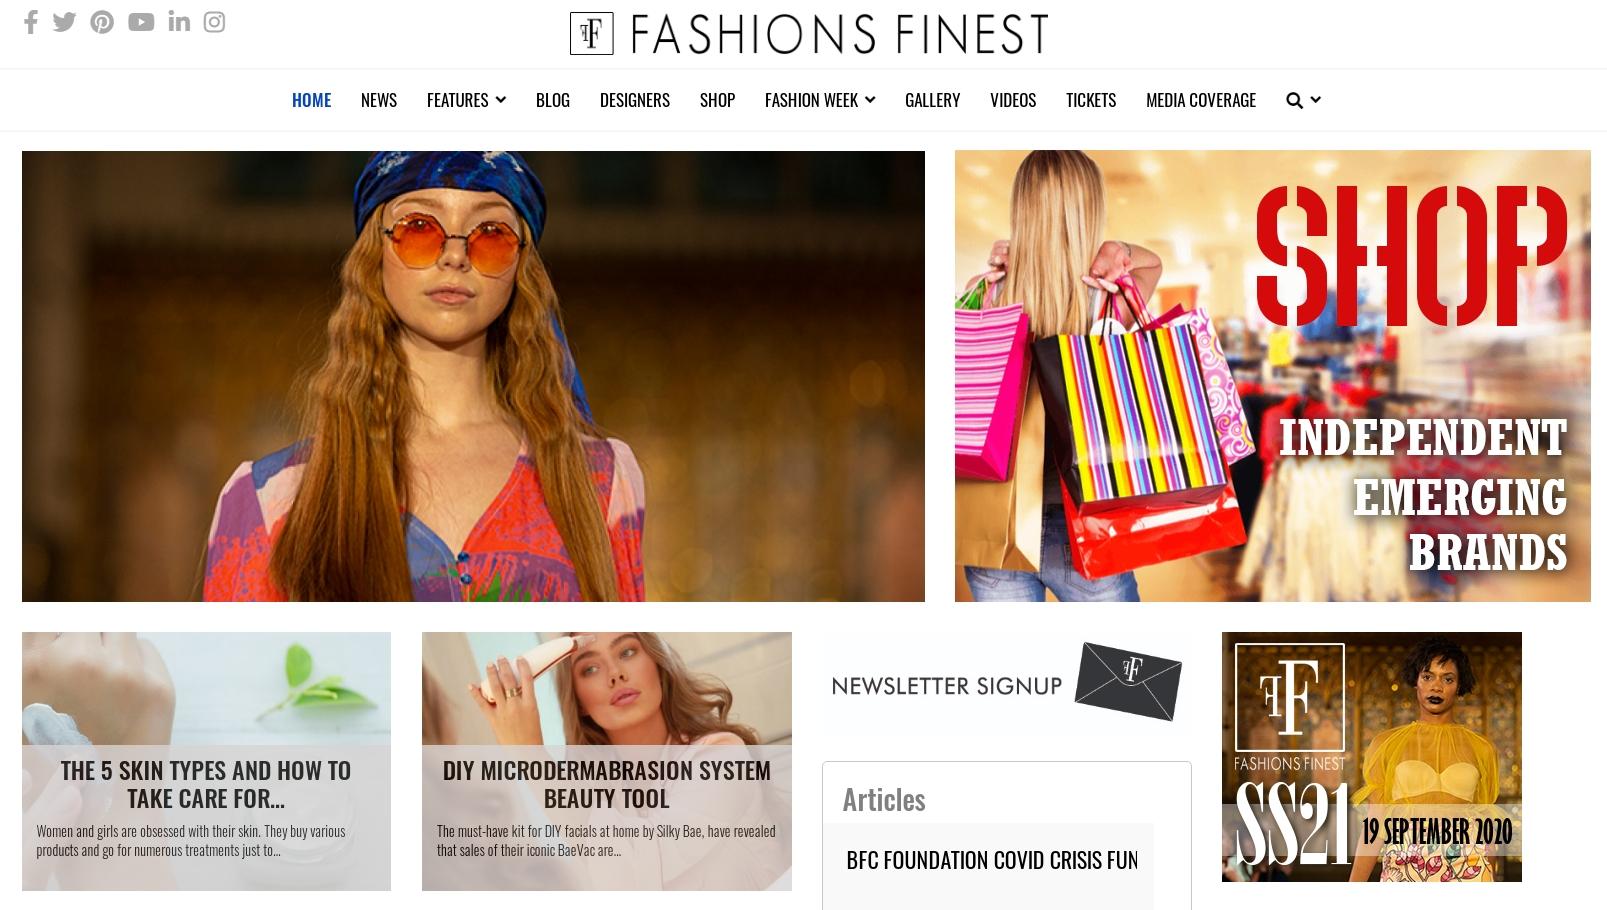 FashionsFinest.com